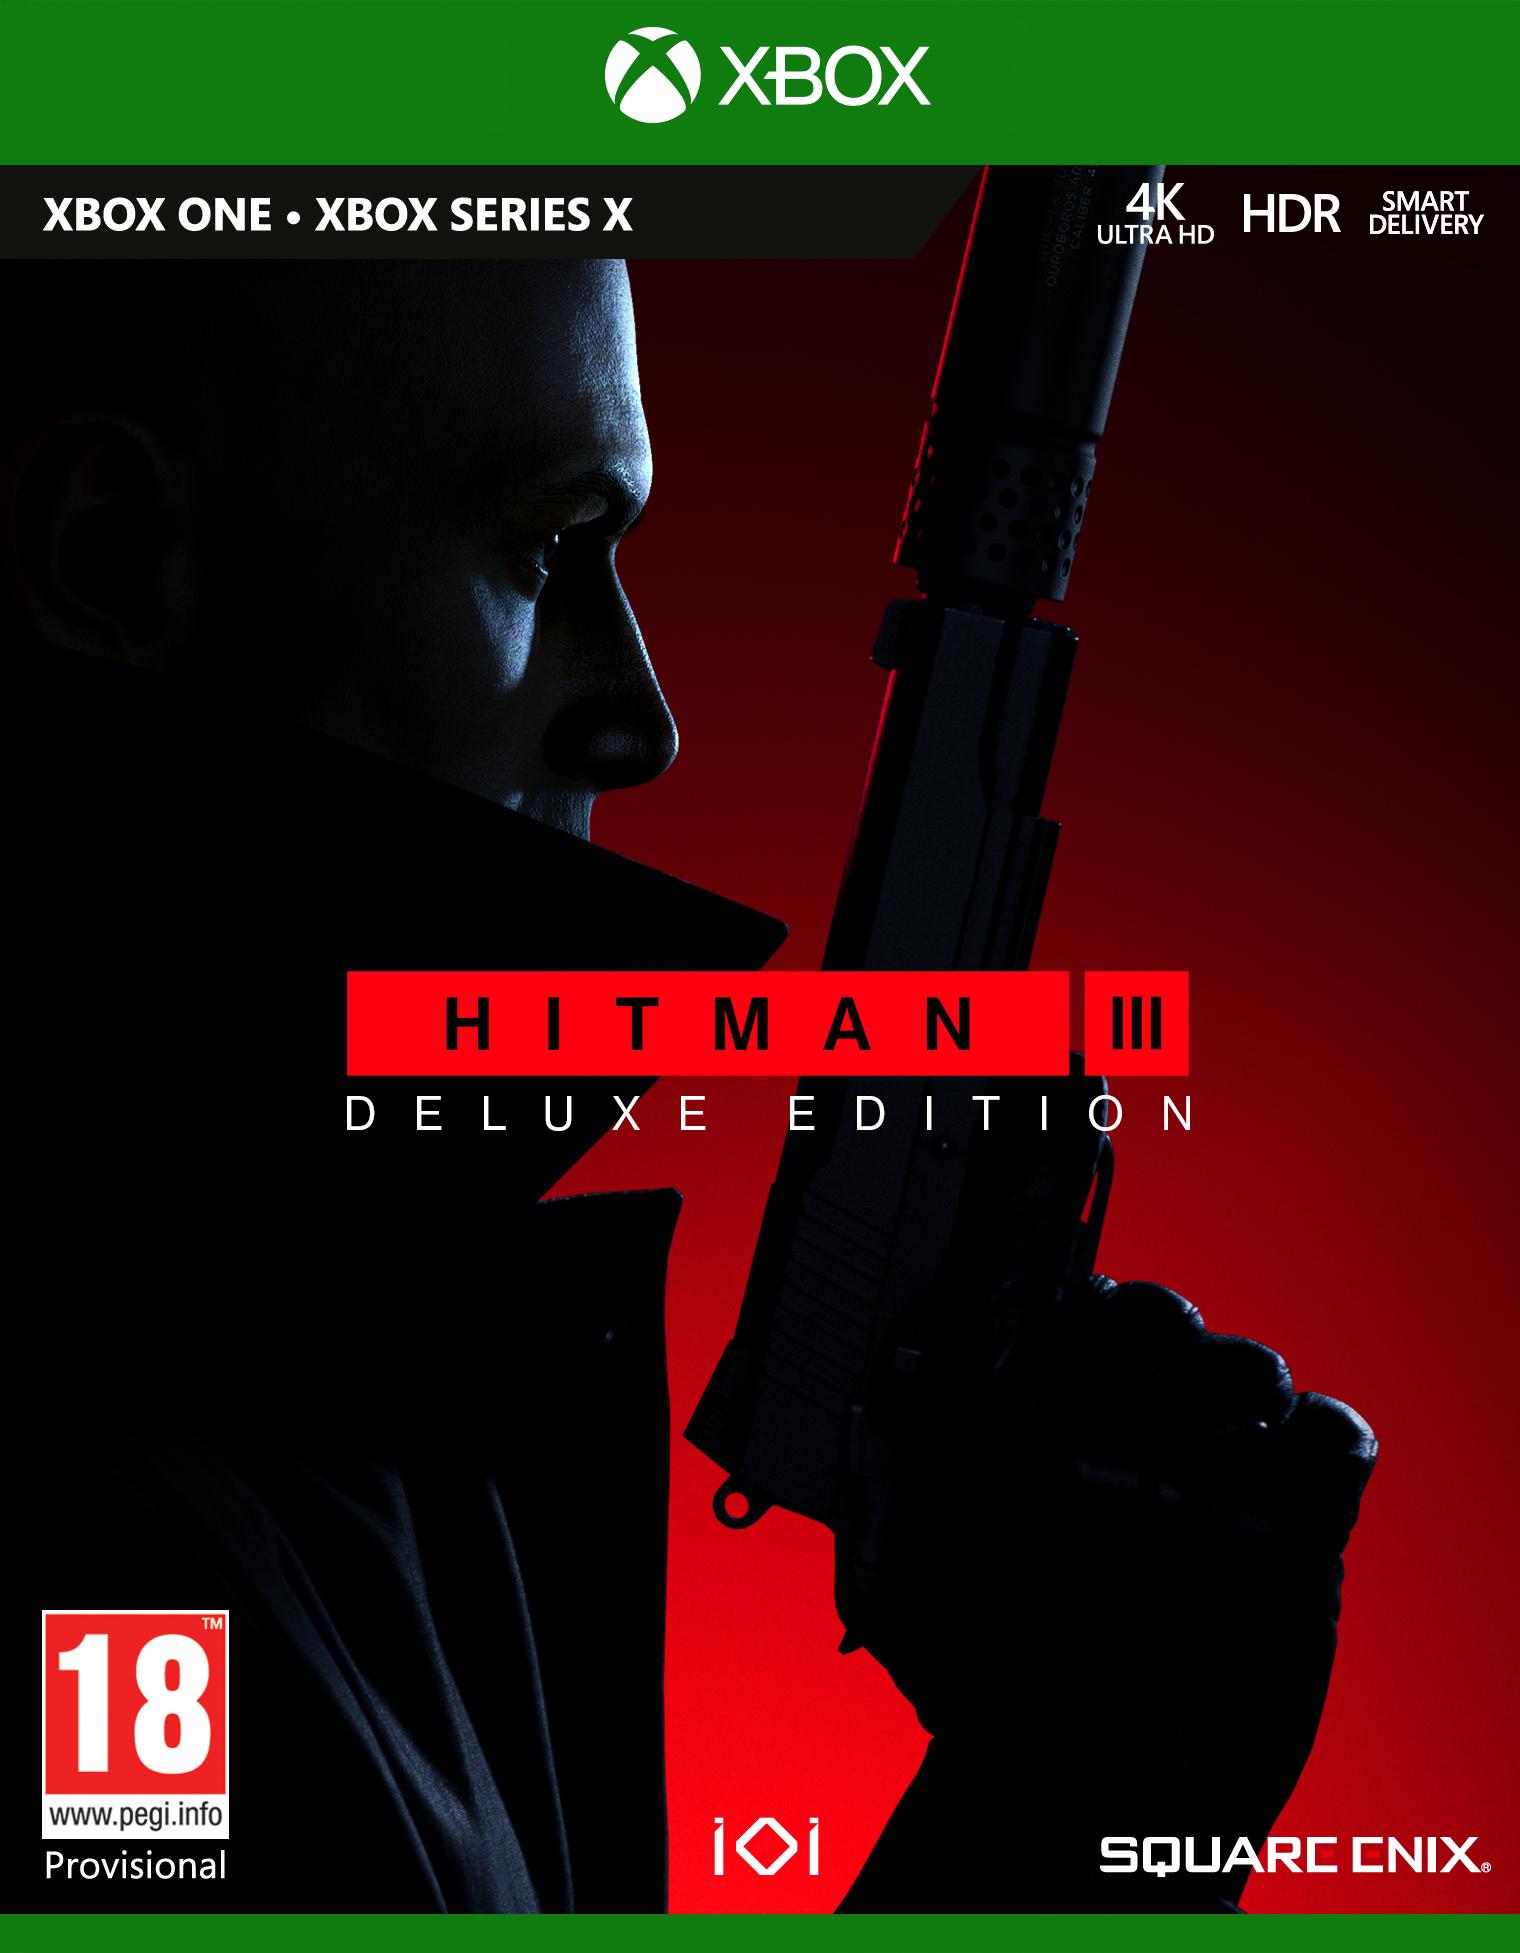 HITMAN III DELUXE EDITION XBOX X | Square Enix Store